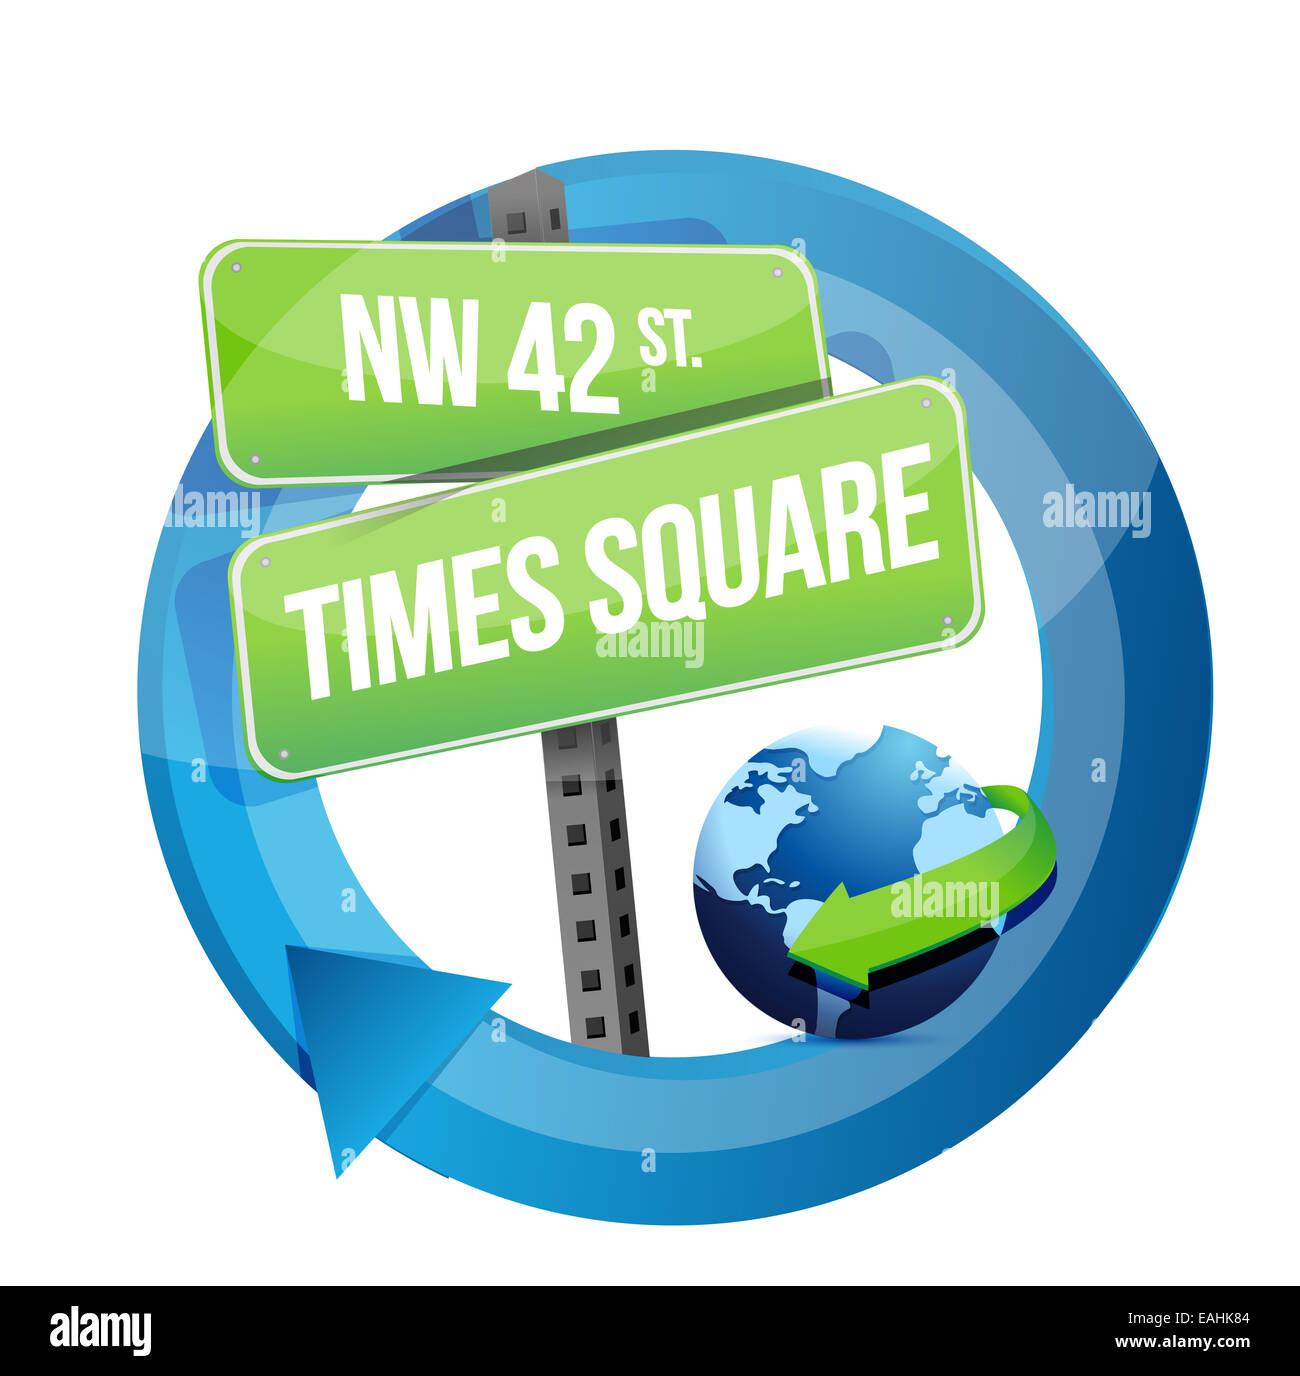 Times square road sign illustration design - Stock Image